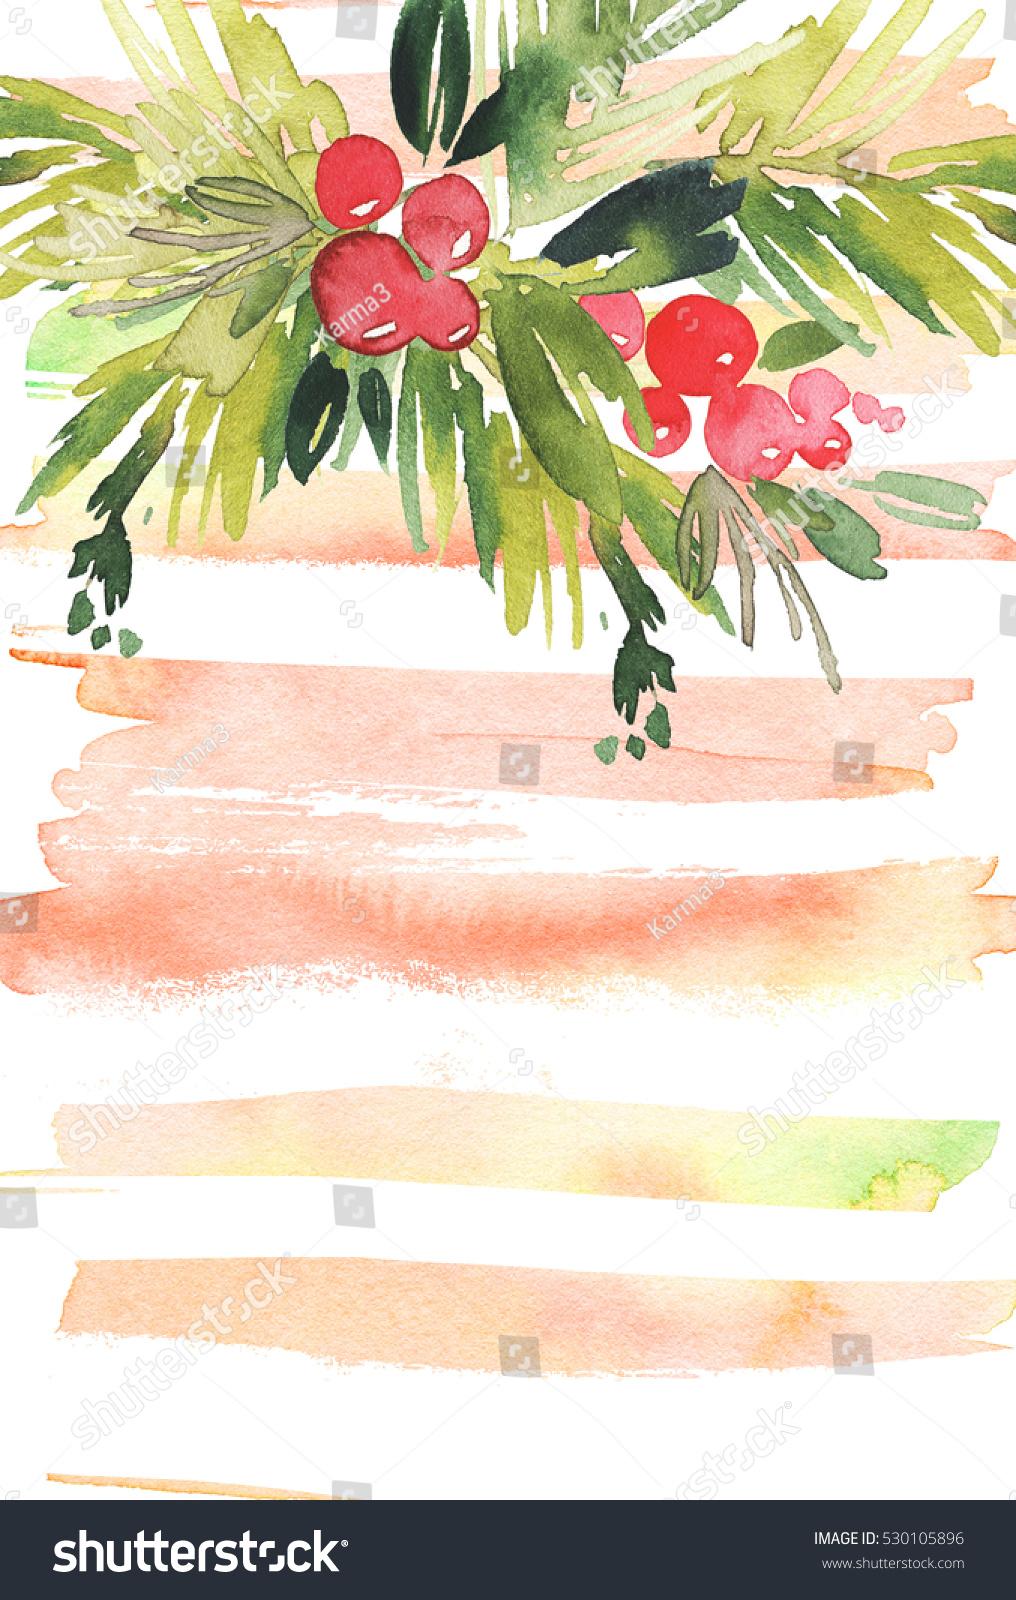 christmas card watercolor illustration handmade - Palm Tree Christmas Cards